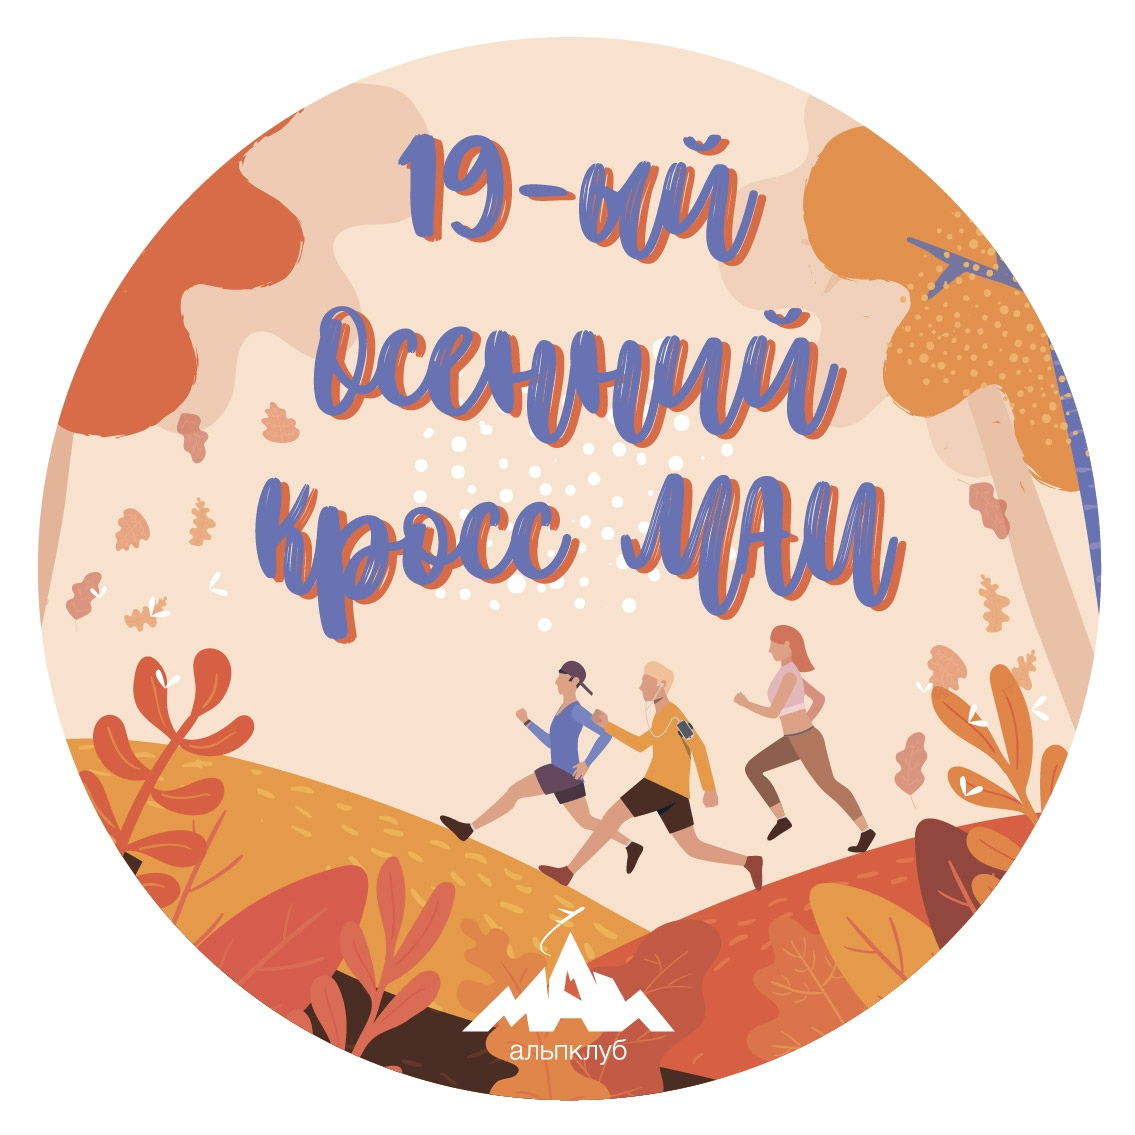 Осенник крос МАИ 2019